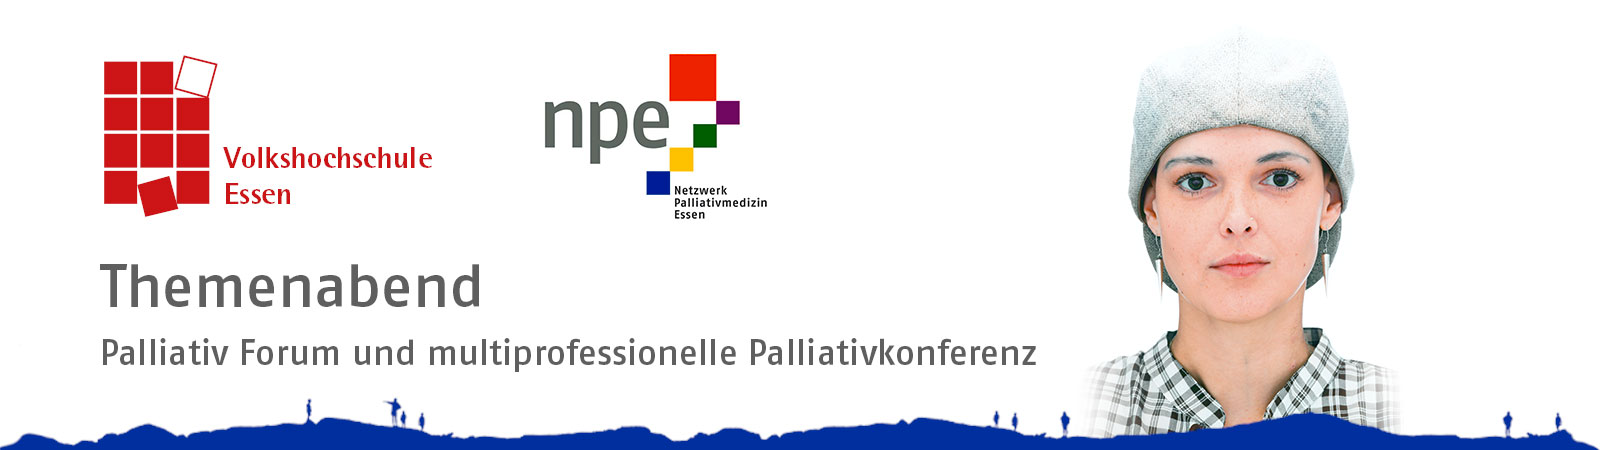 Themenabend Palliativ Forum